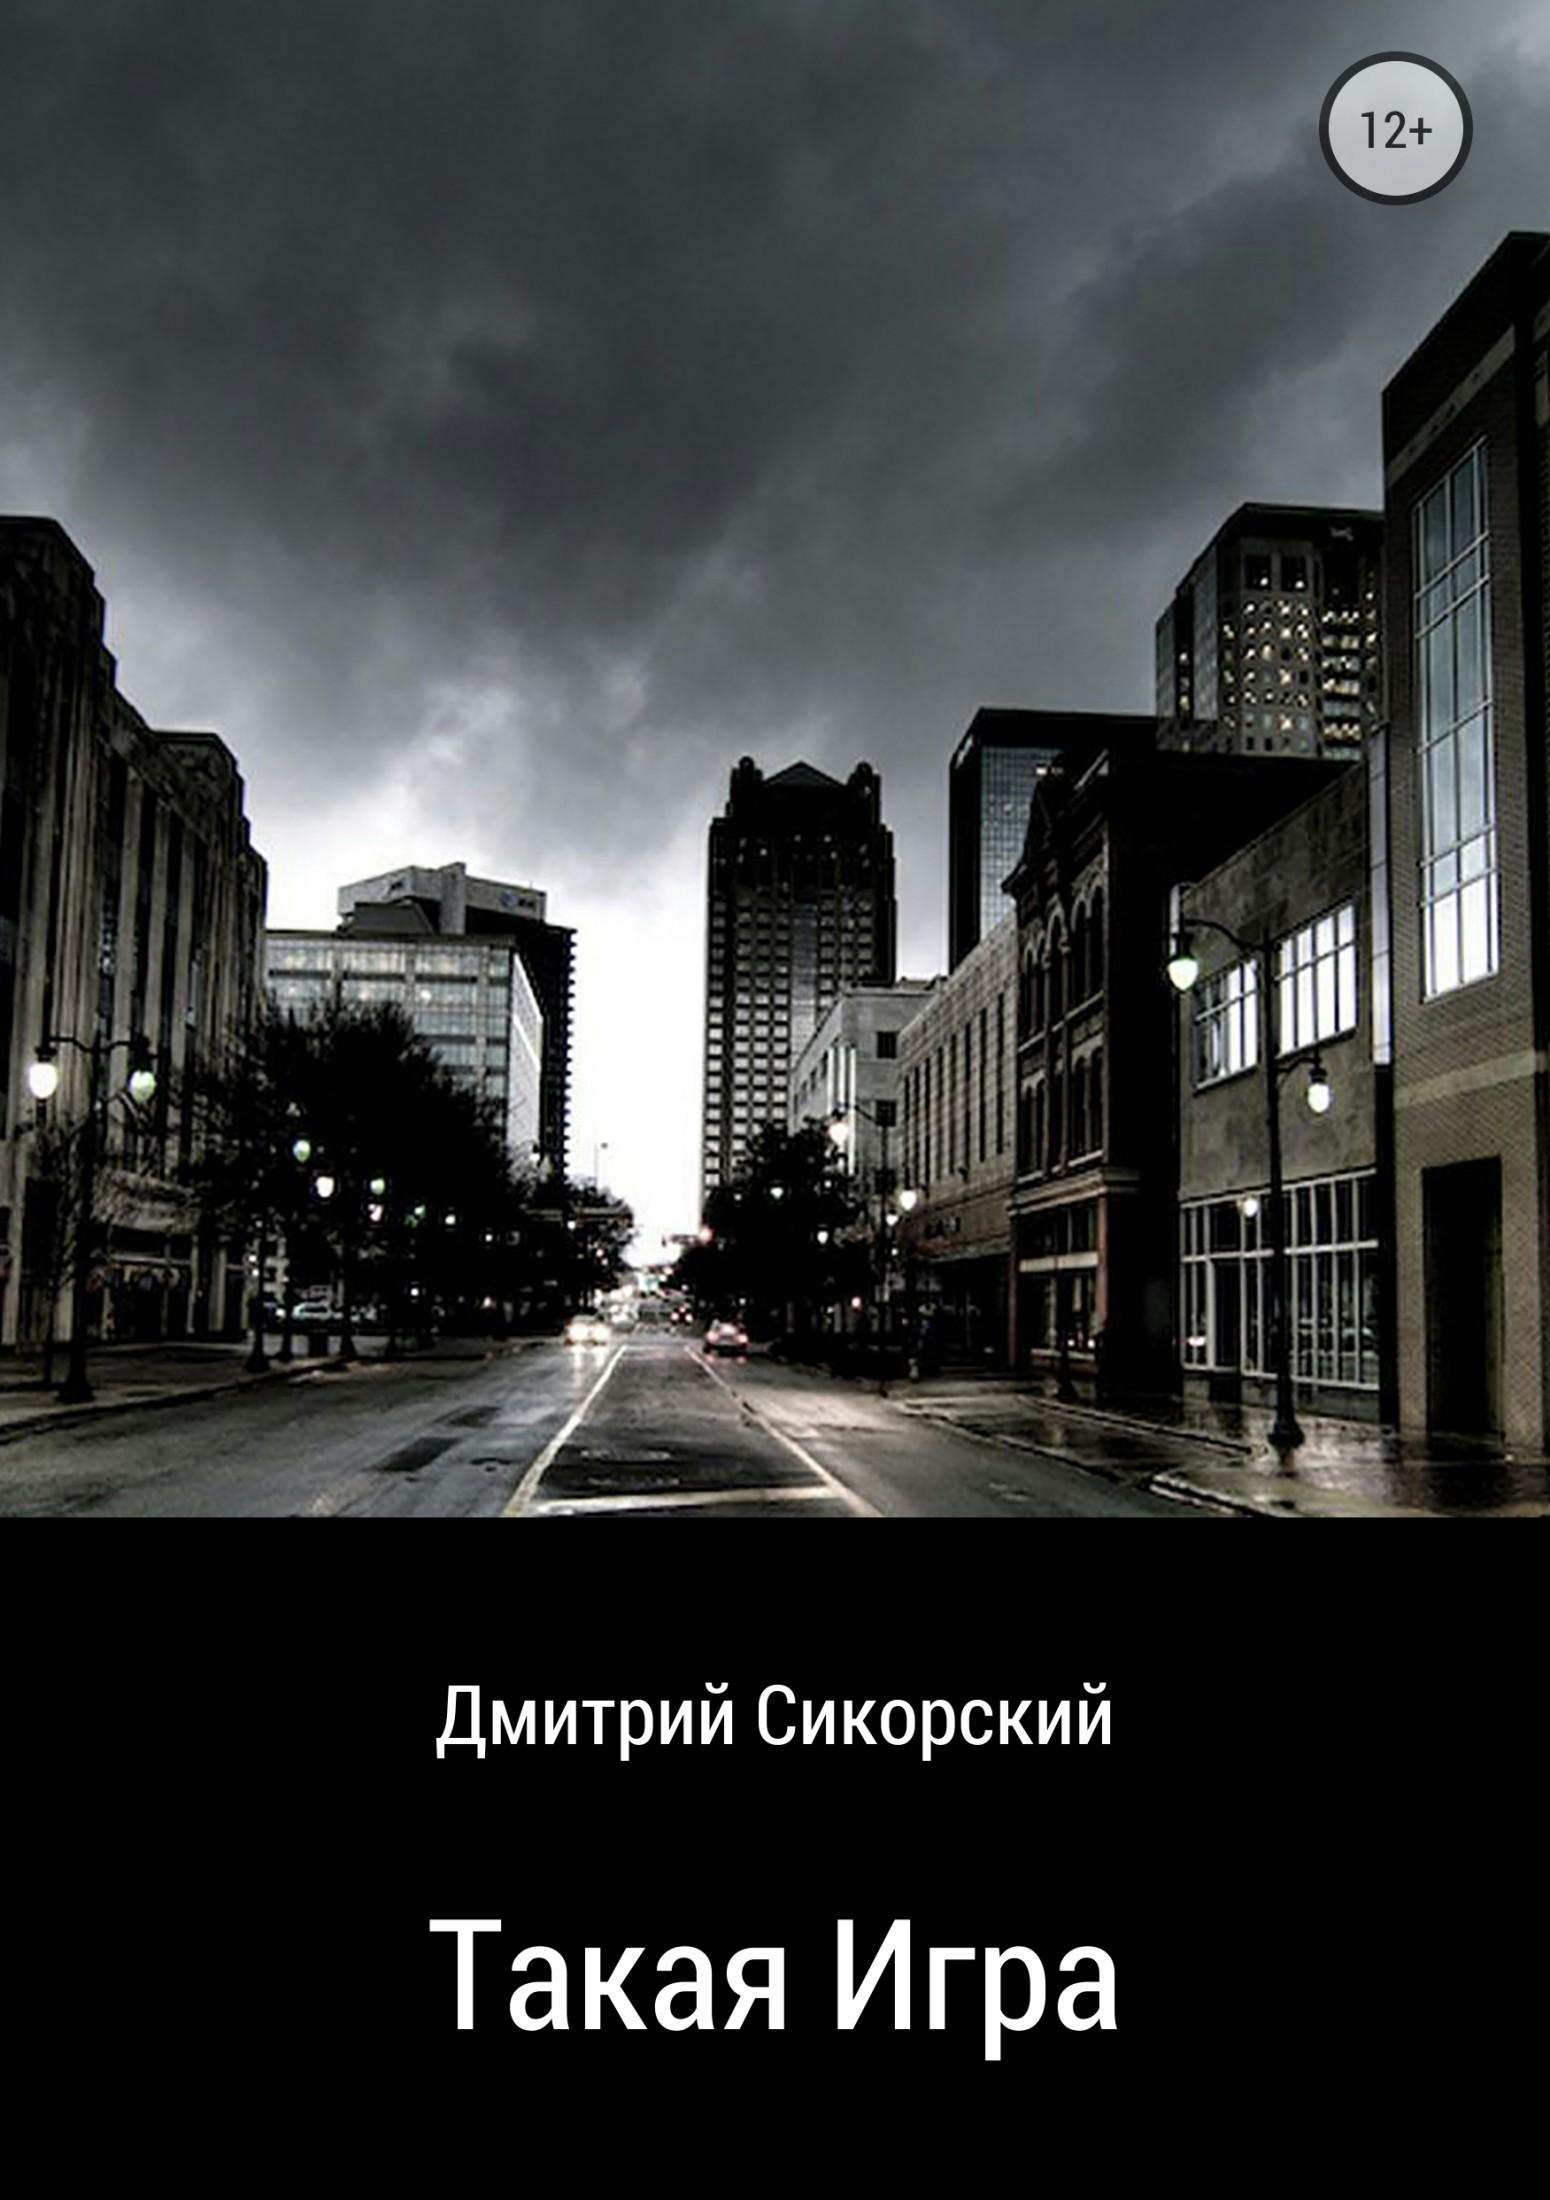 Дмитрий Сикорский бесплатно